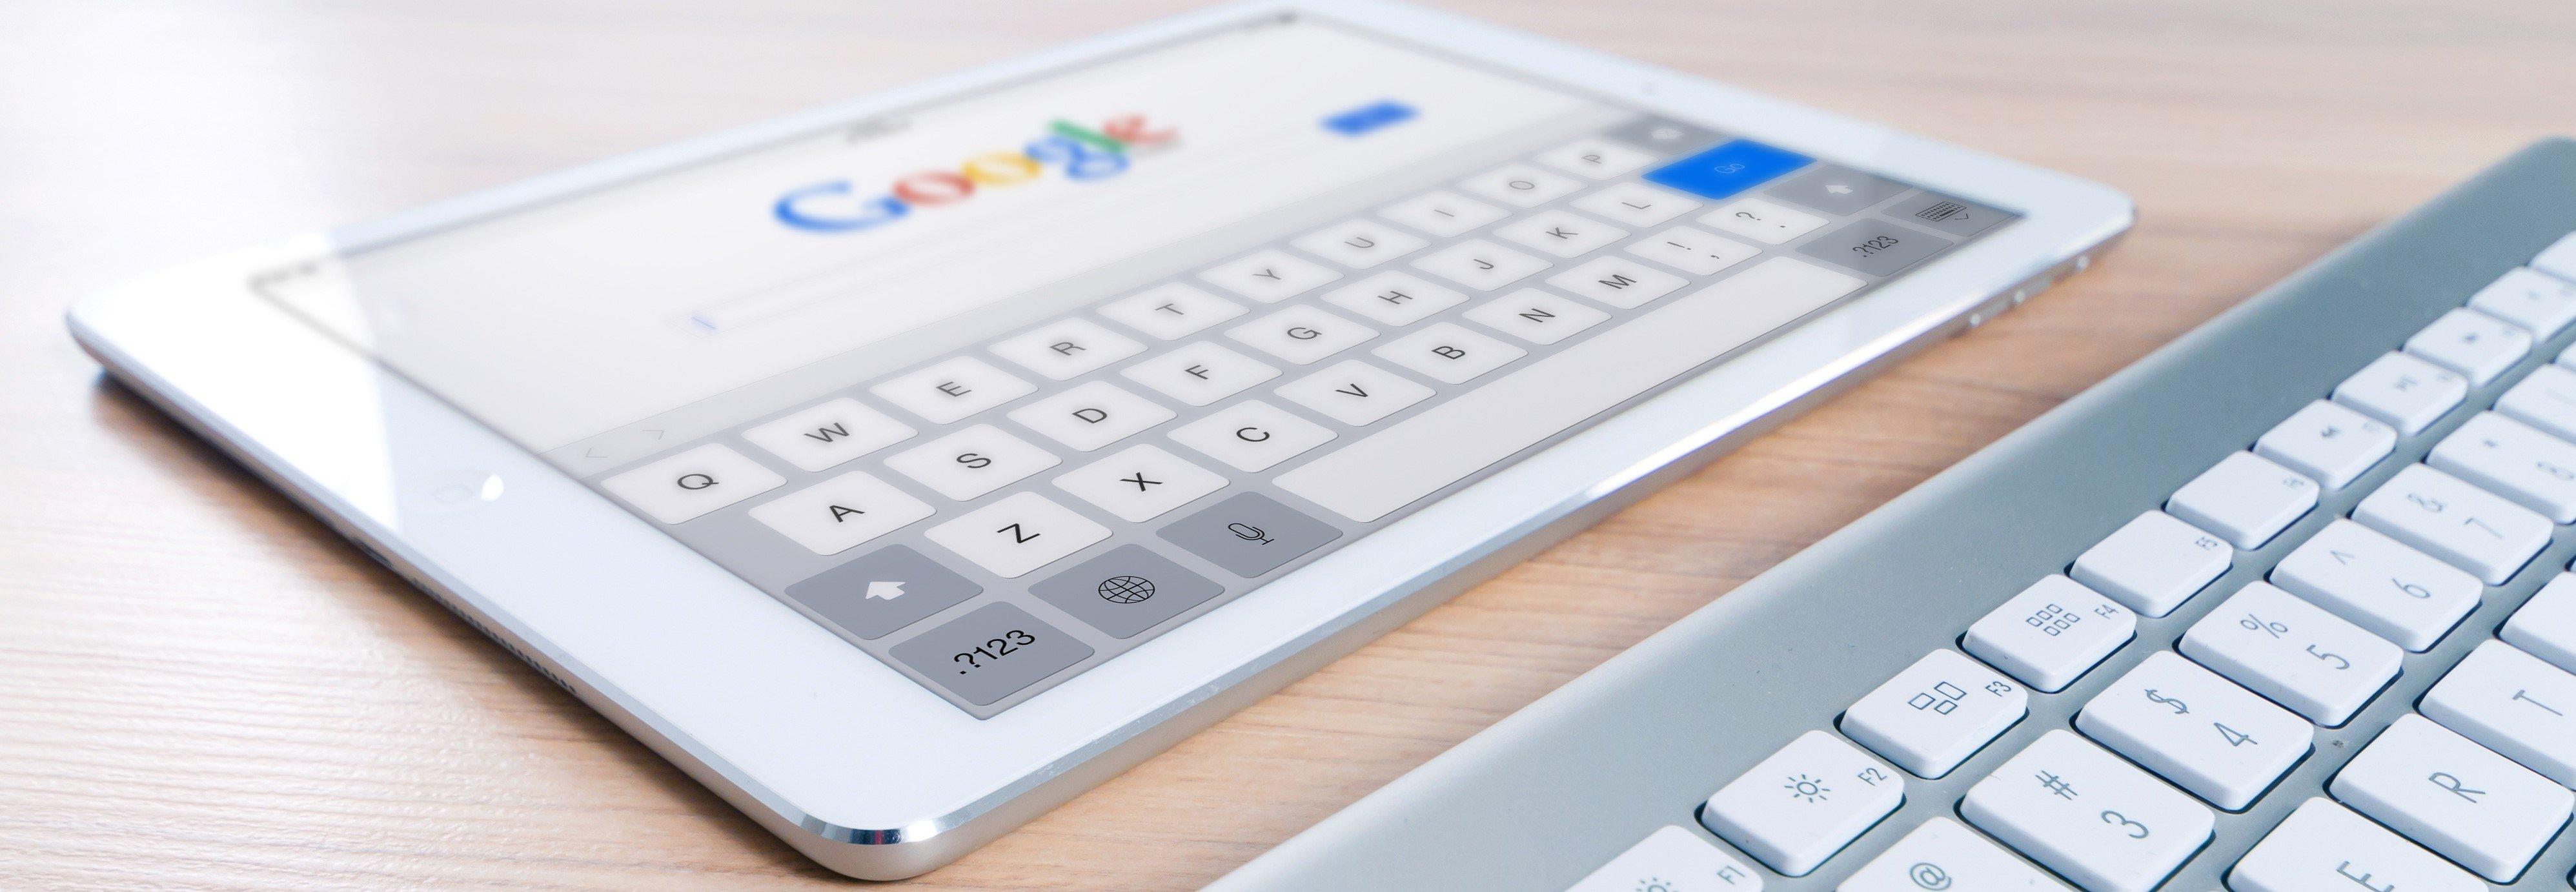 apple-keyboard-ipad-technology-advertising-web-759444-pxhere.com